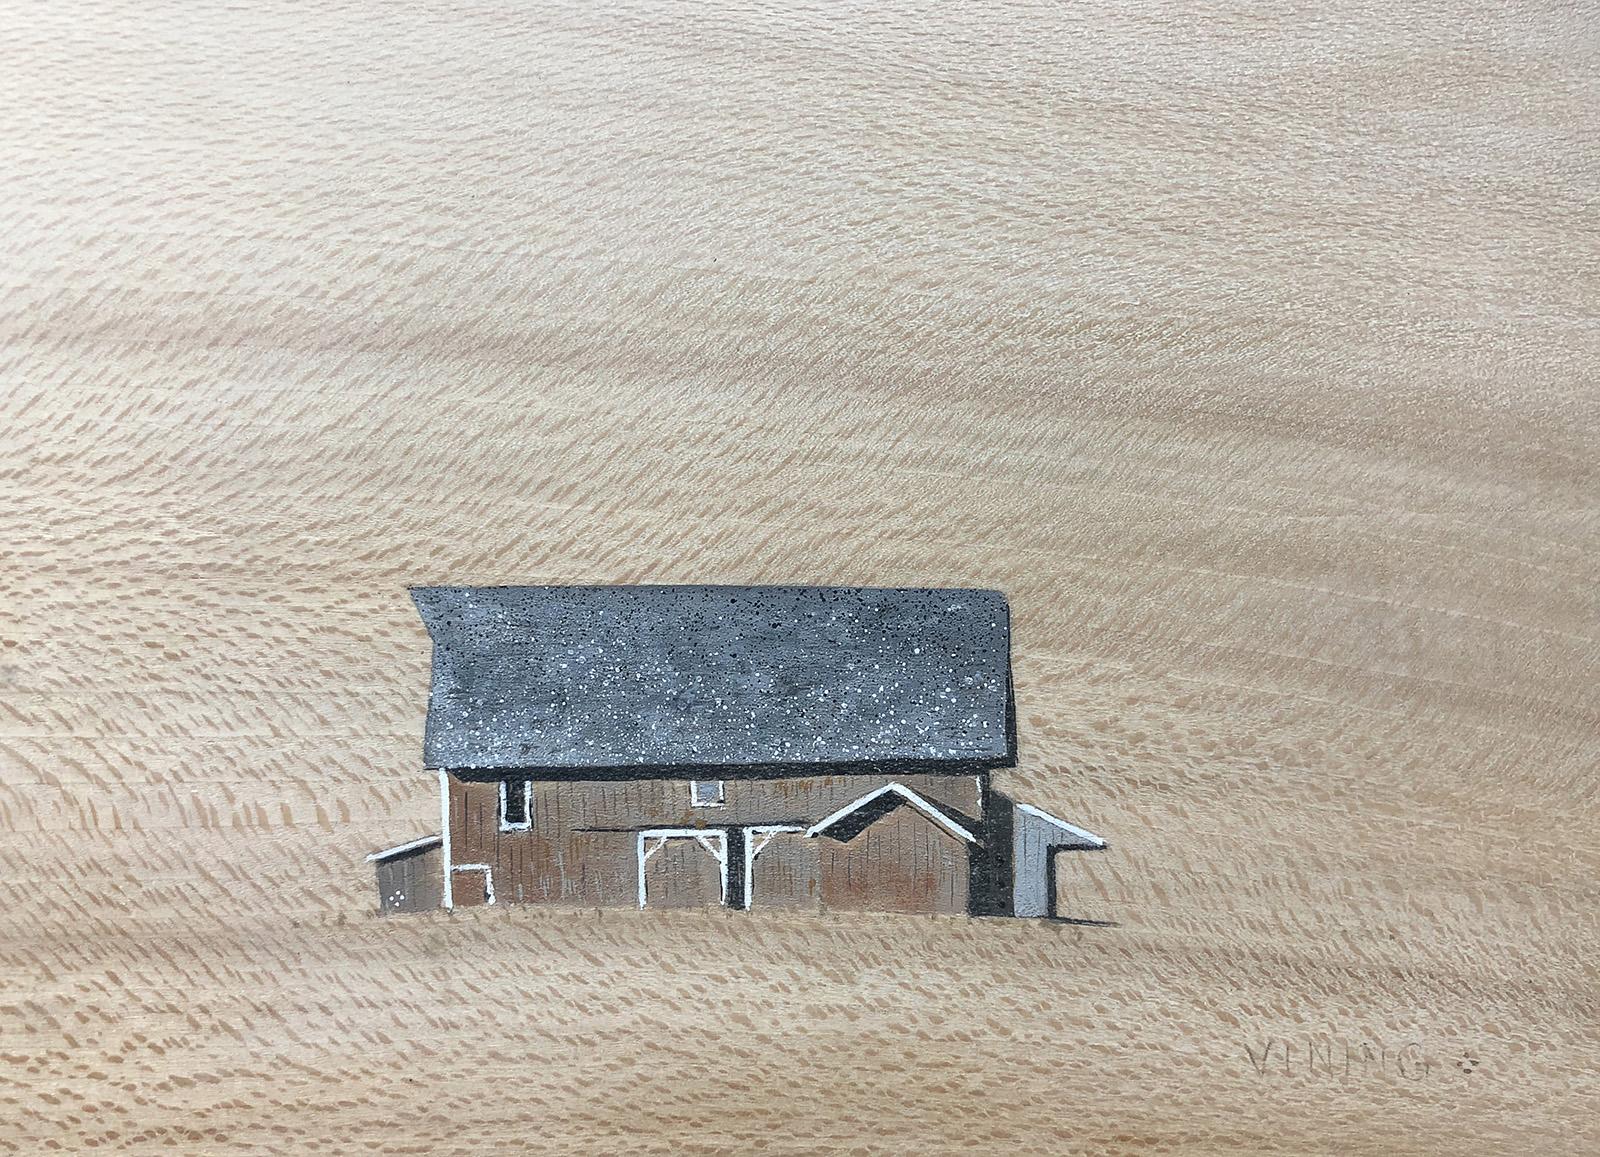 Rochester Barn - Justin Vining 6x8 (for web).jpg